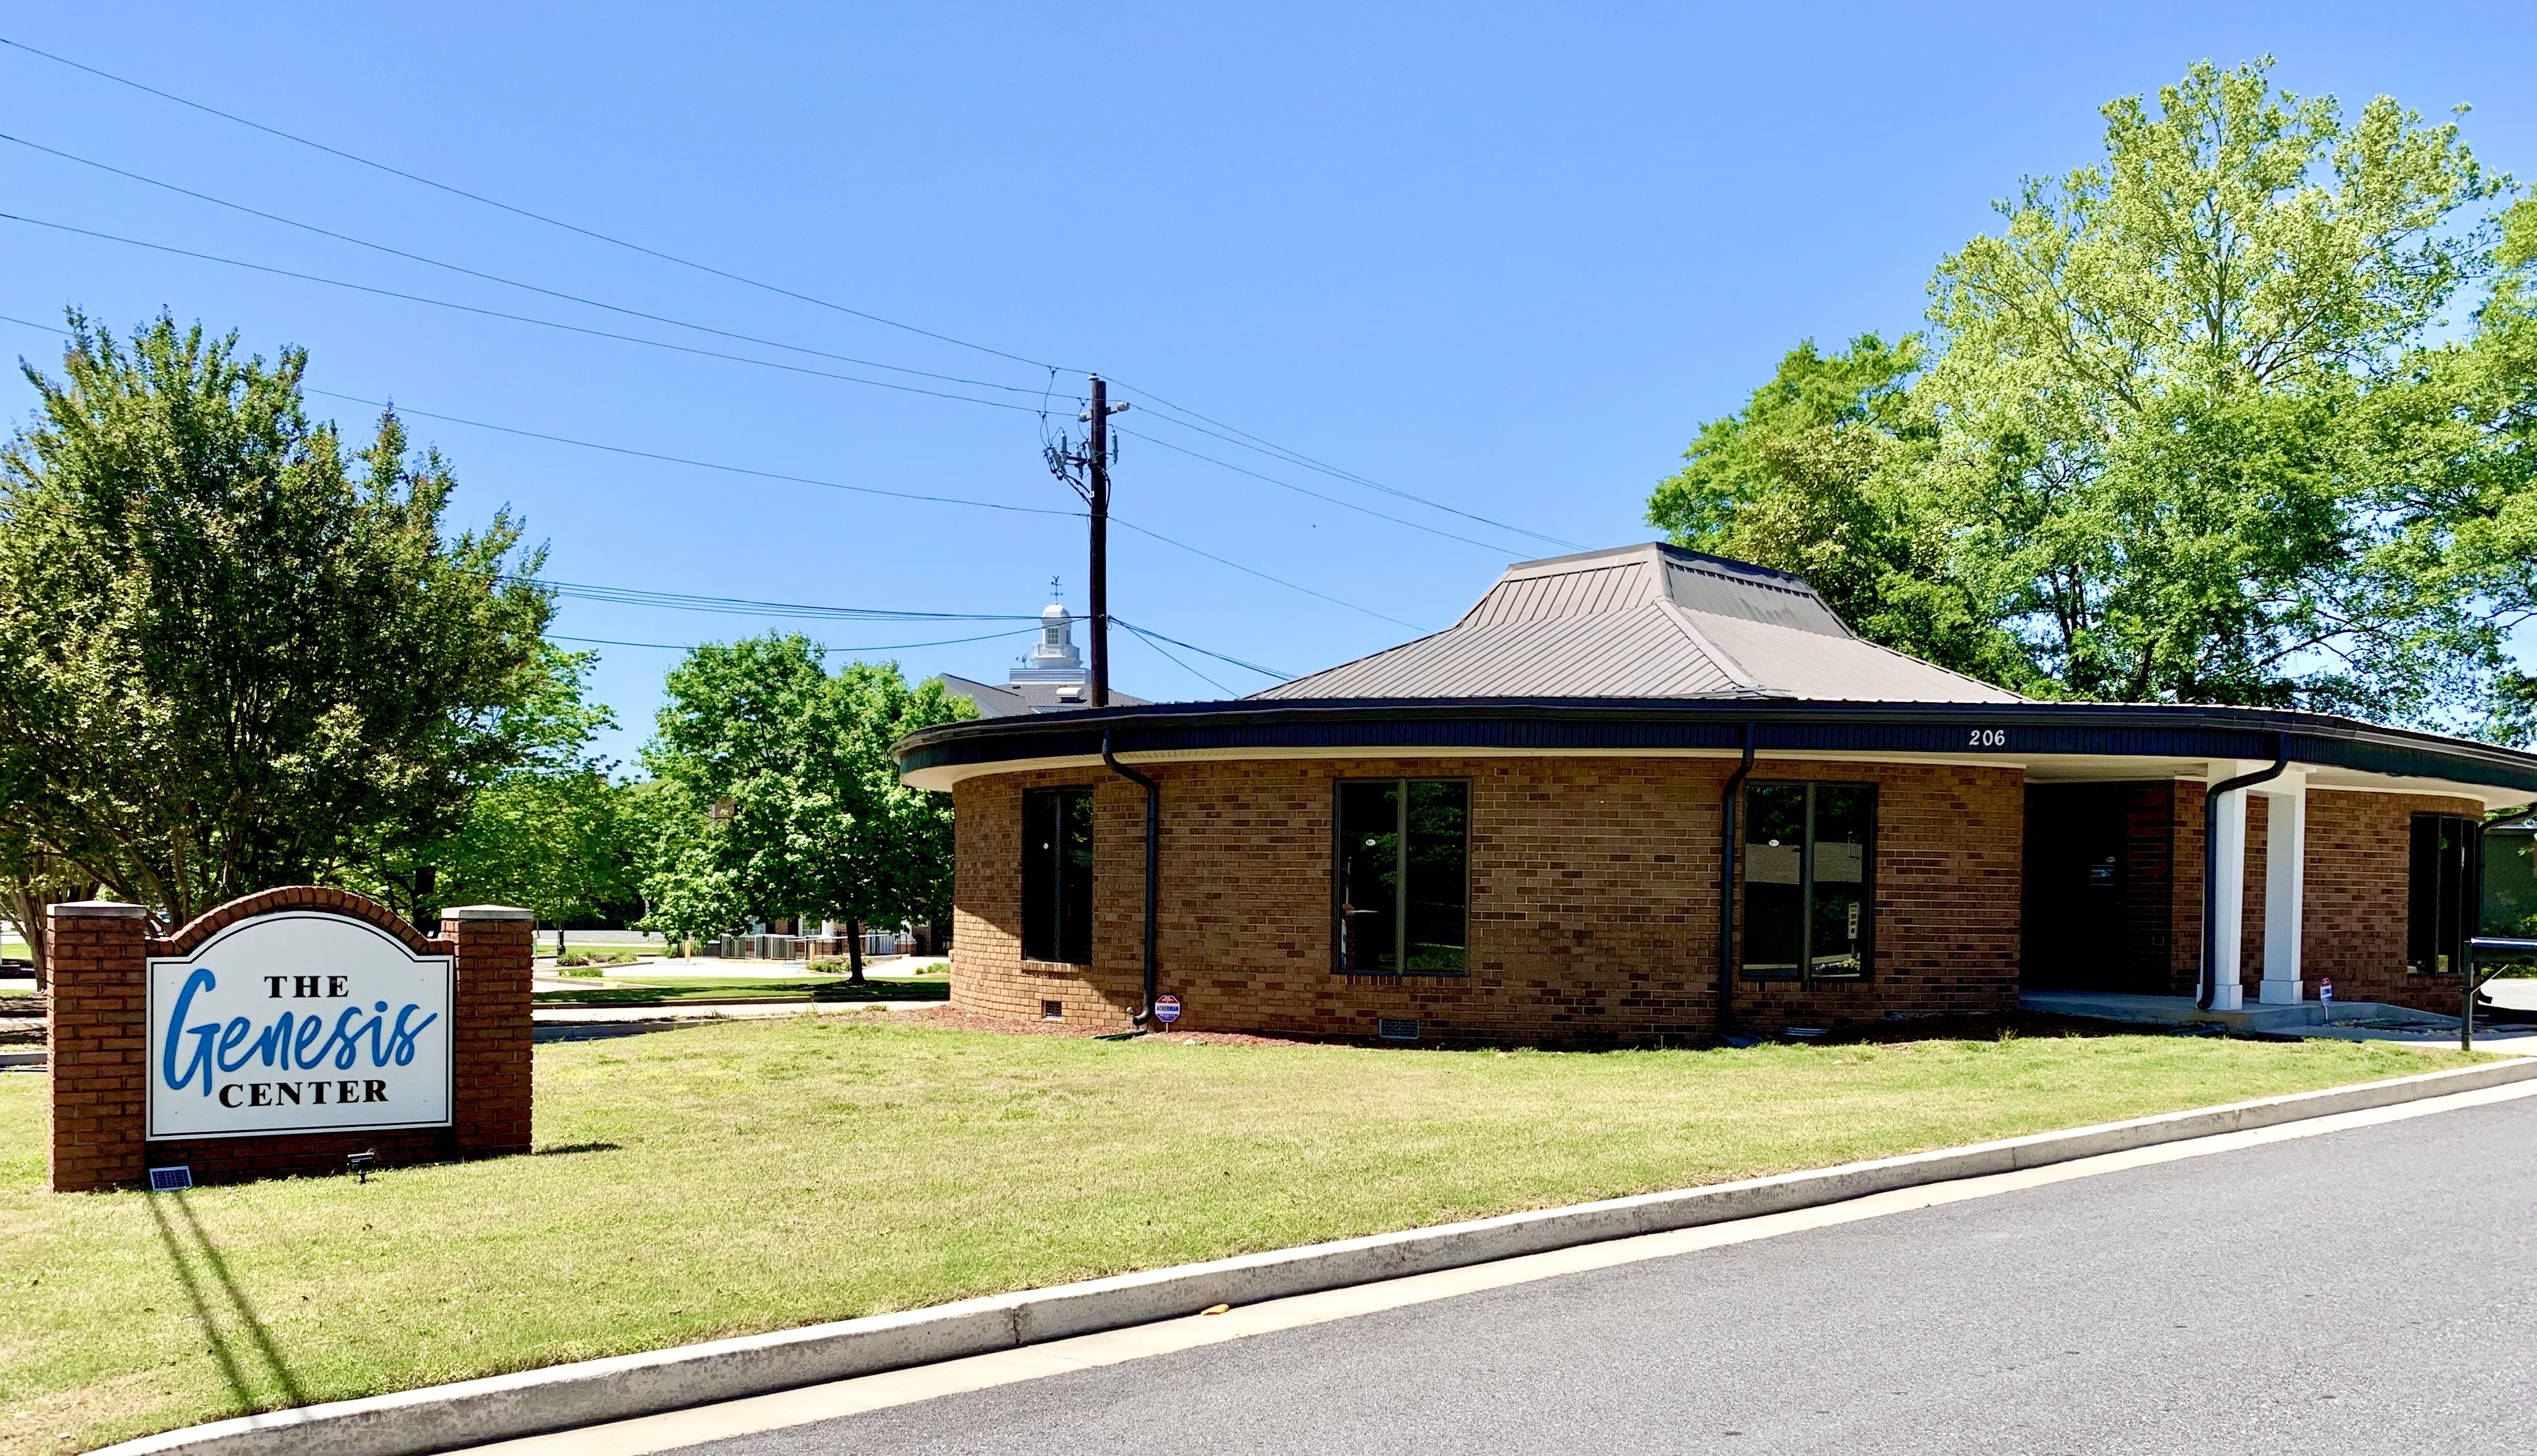 The Genesis Center of Winder